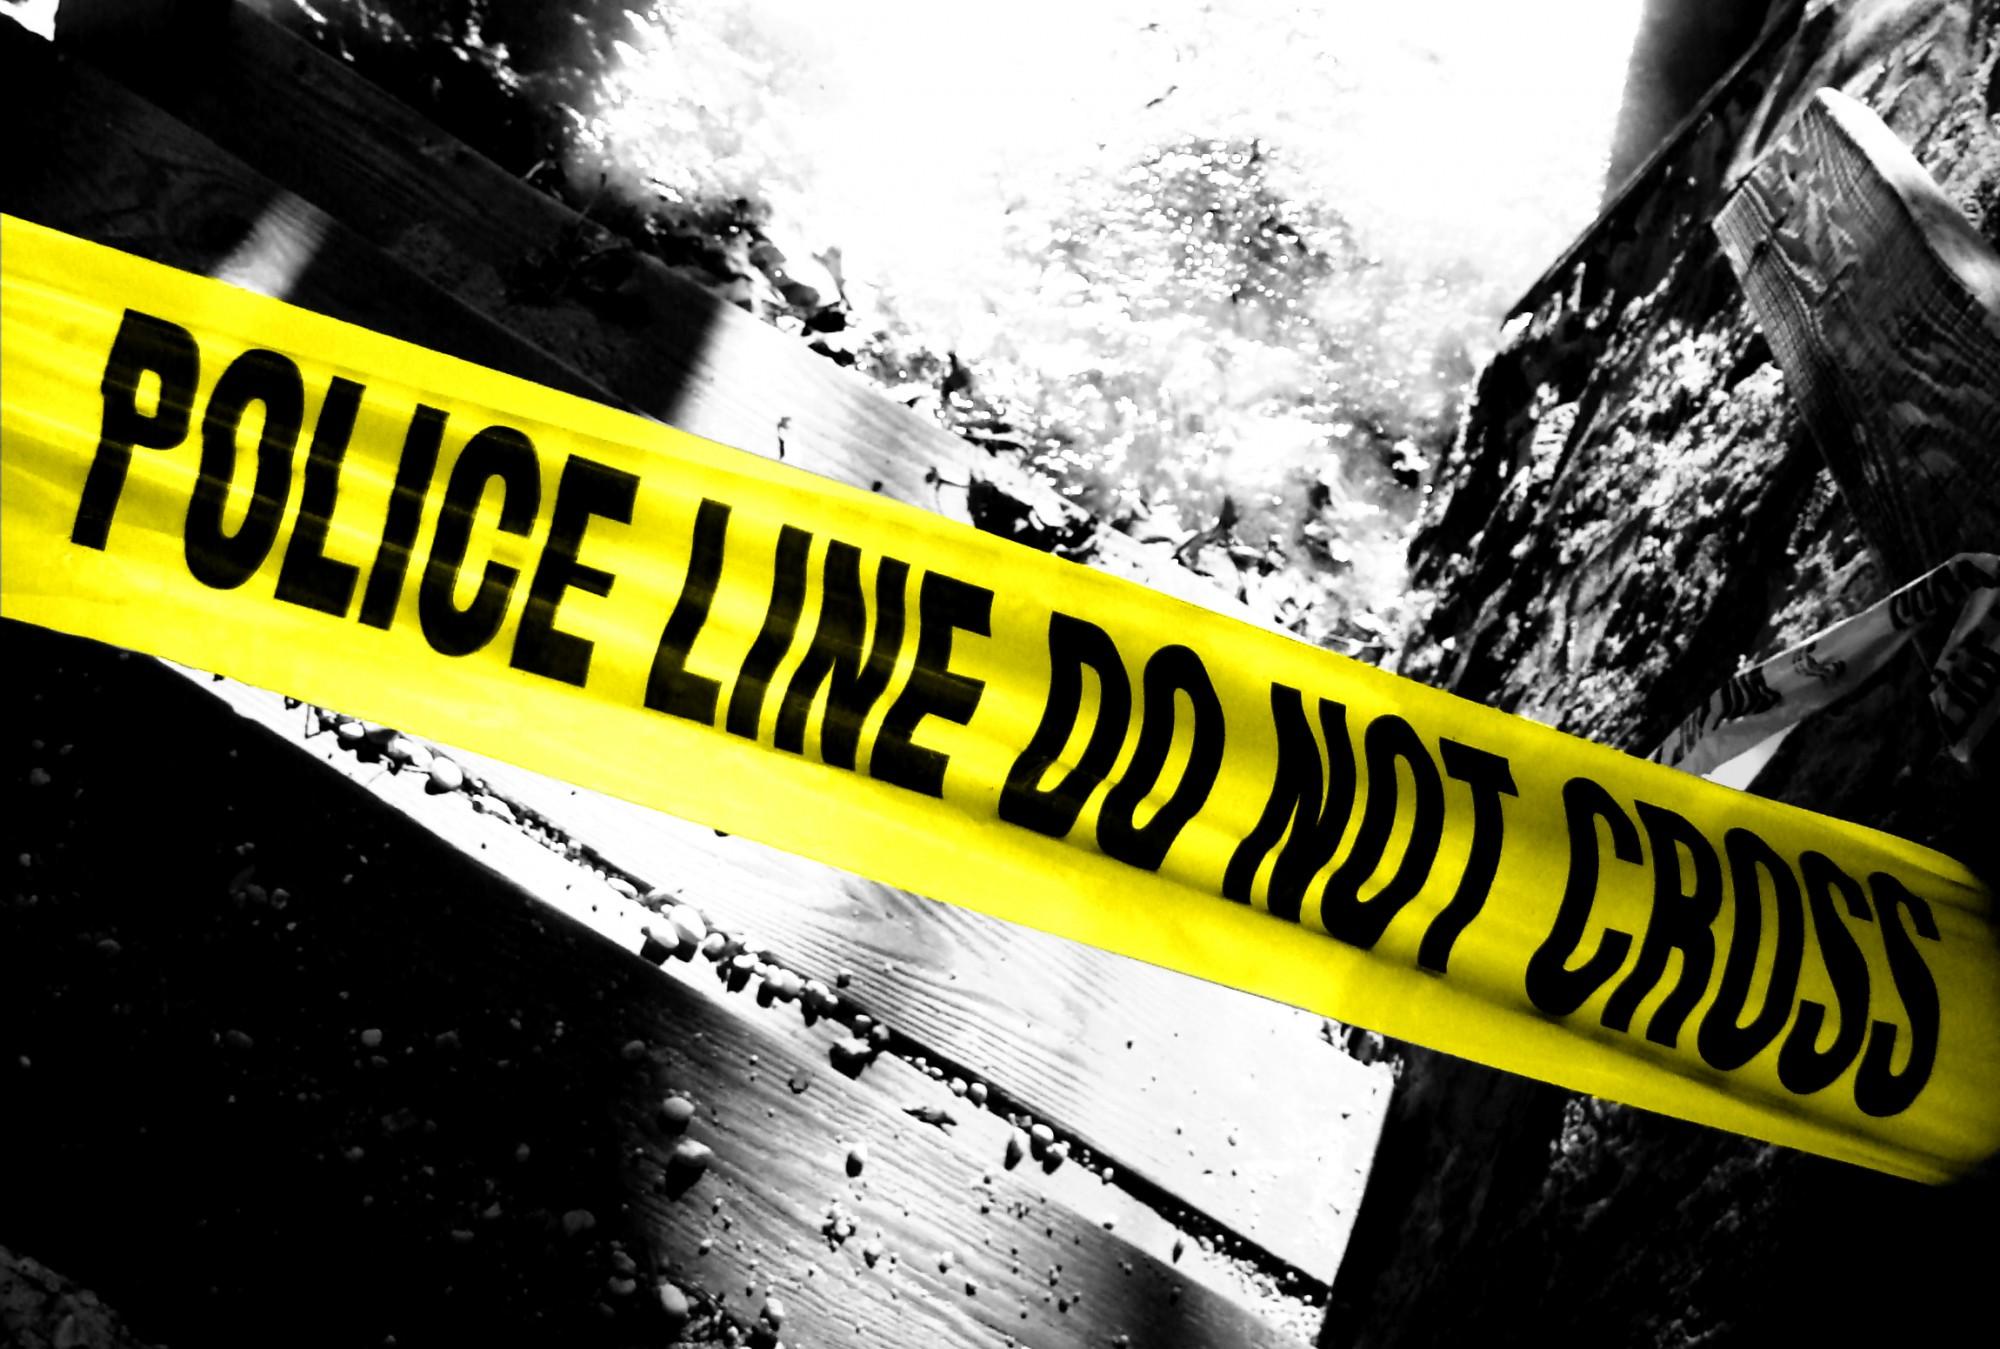 EDMONTON POLICE INVESTIGATING SUSPICIOUS DEATH